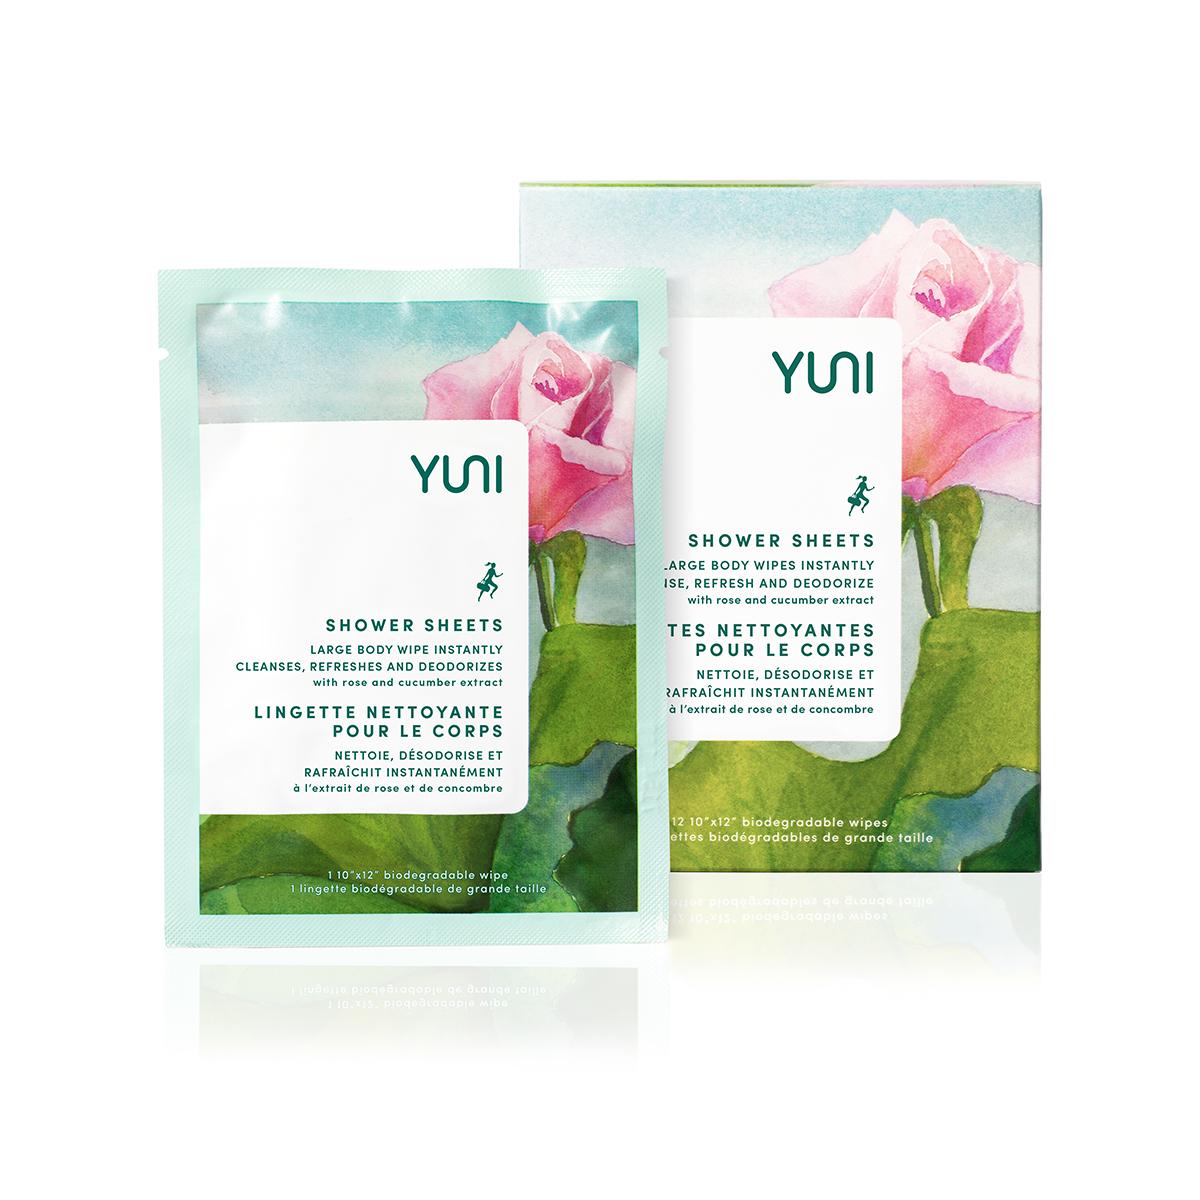 YUNI's rose cucumber sheets